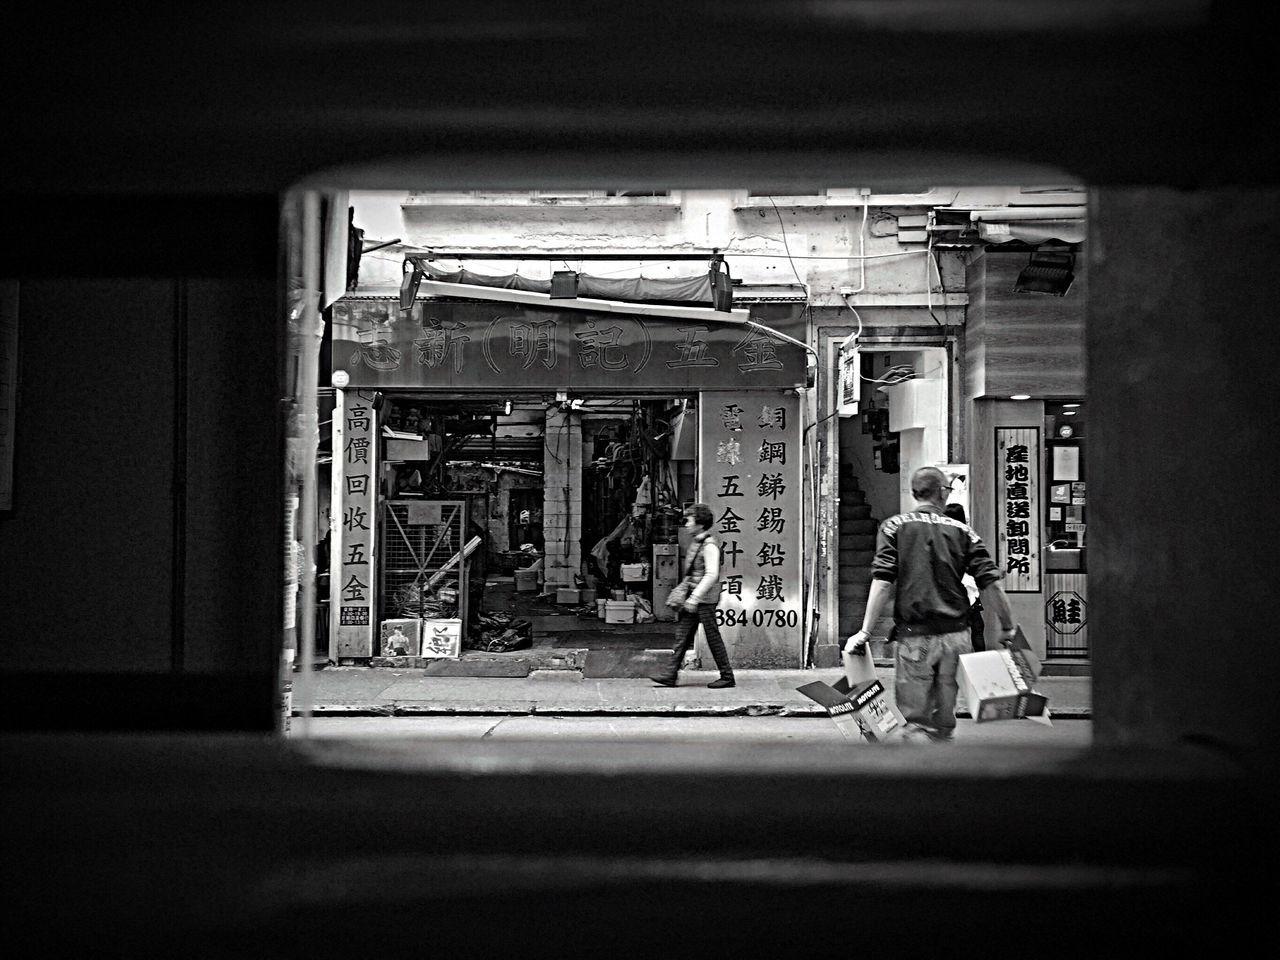 Real People City People Hkig Tsuistyle Photography Wanchai Explore Hk HongKong Hong Kong Cityexplore Discoverhongkong Street City Life People And Places City Streets  City City Street City View  Citylife Blackandwhite Black And White IPhoneography Iphoneonly IPhone IPhone Photography EyeEmNewHere EyeEmNewHere